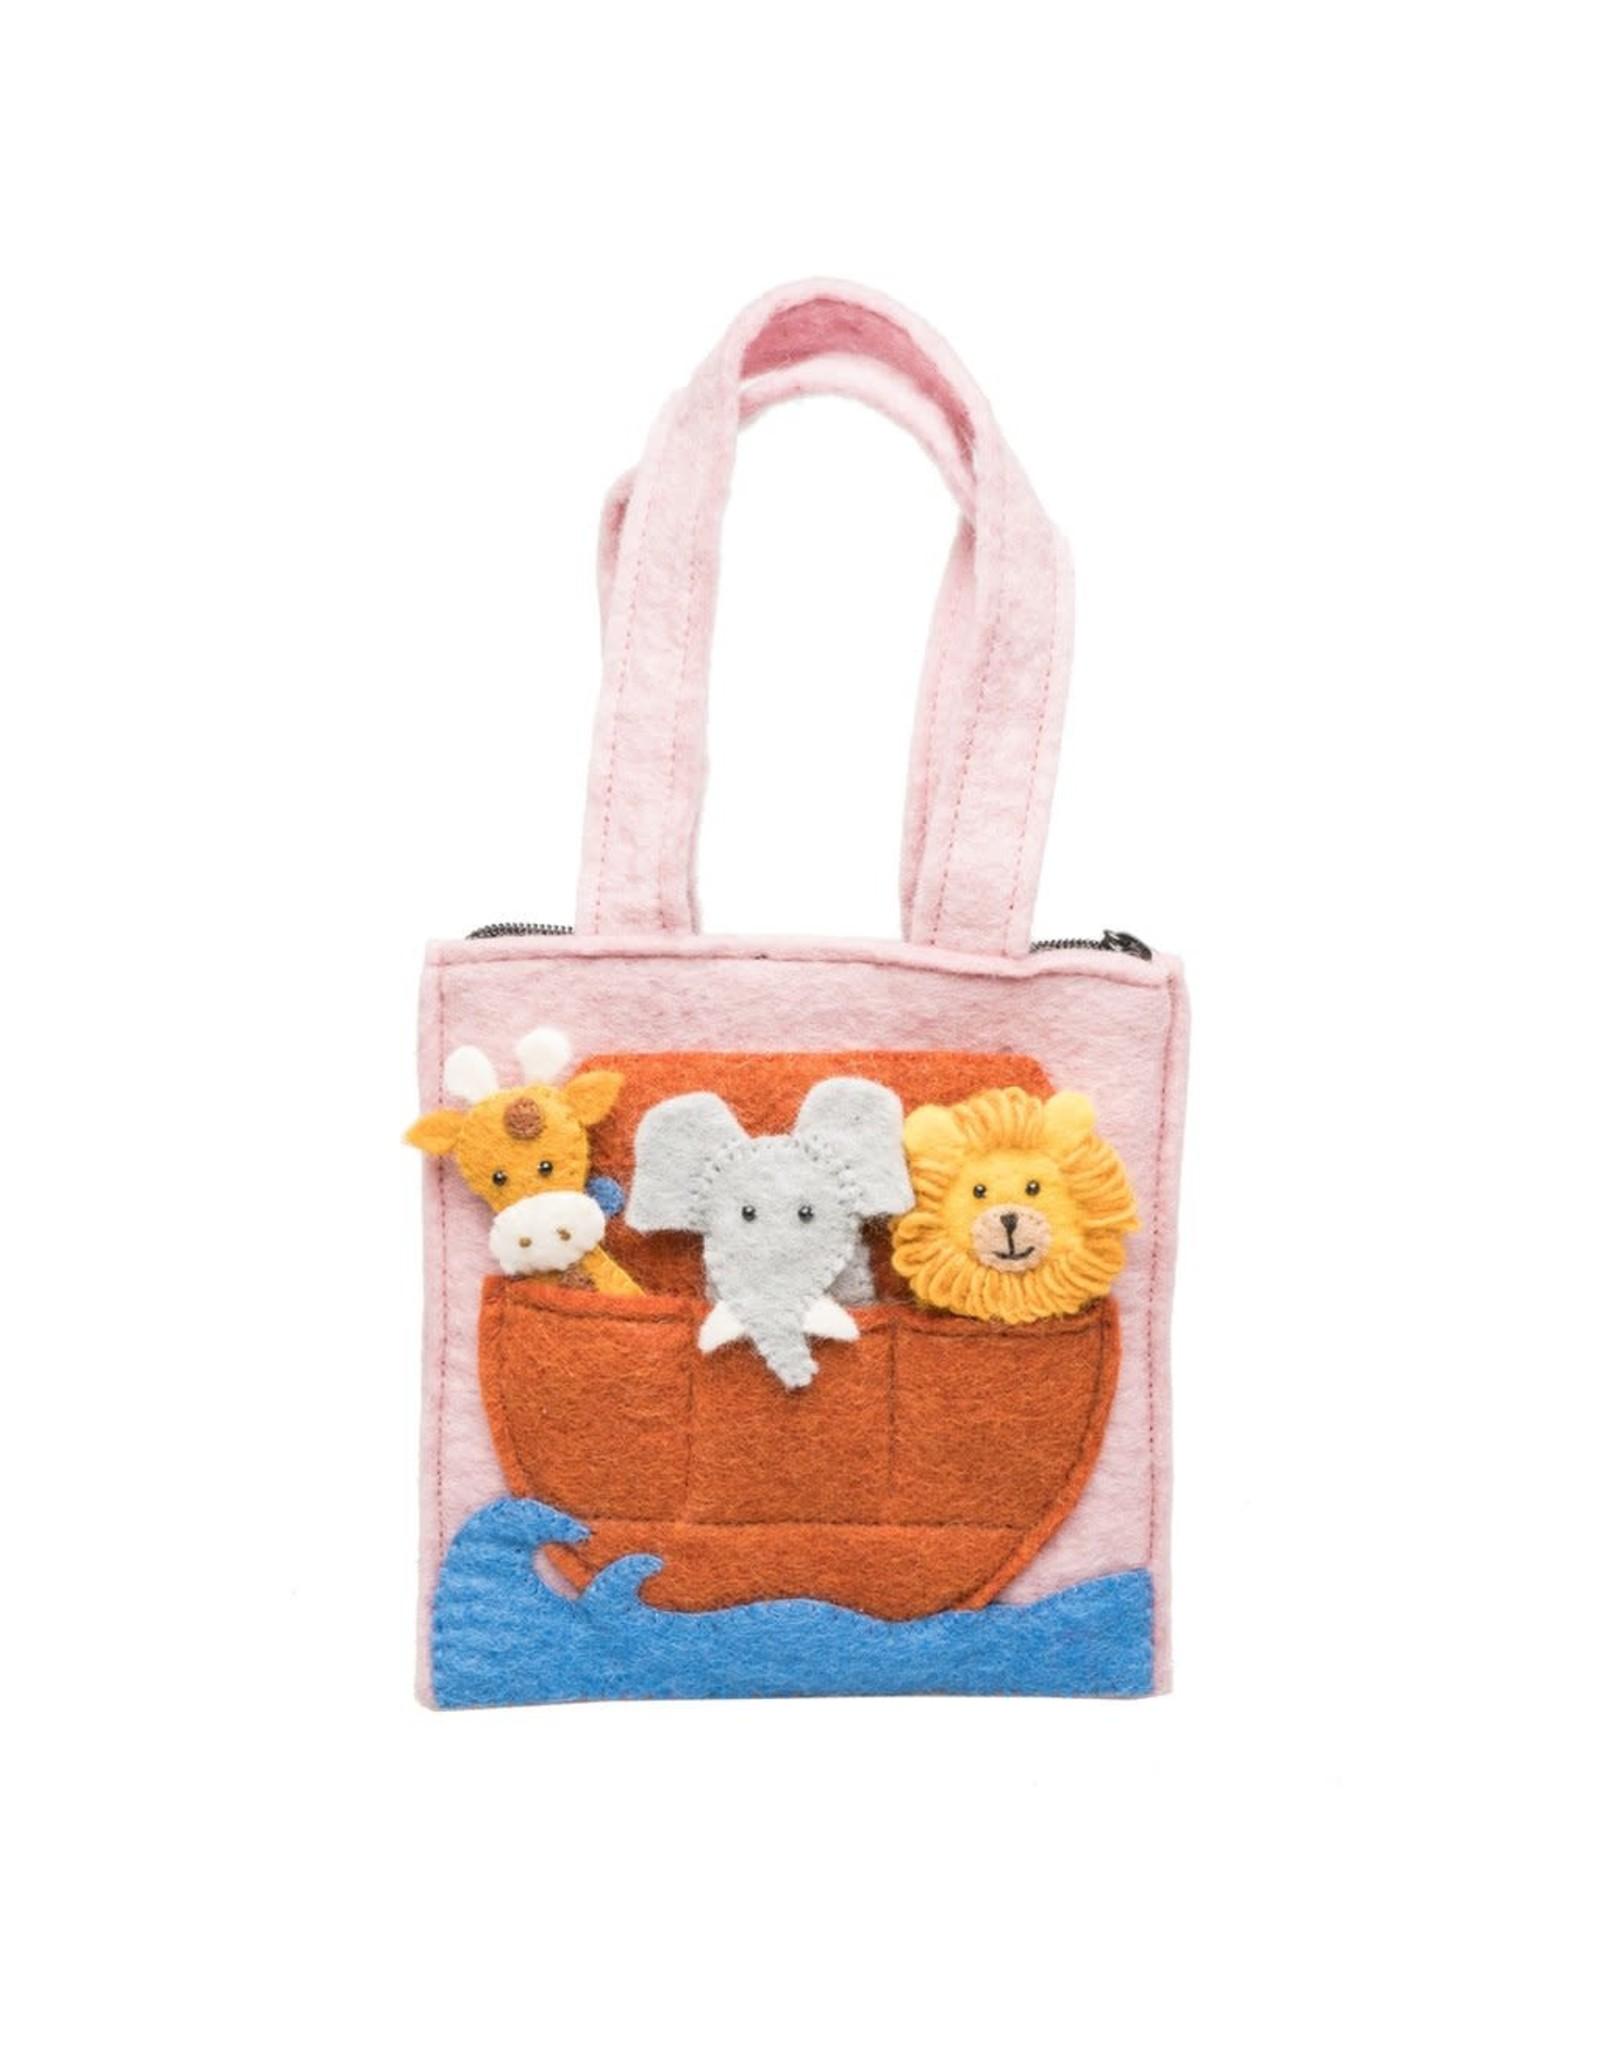 Felt Noah's Ark Puppet Bag, Nepal